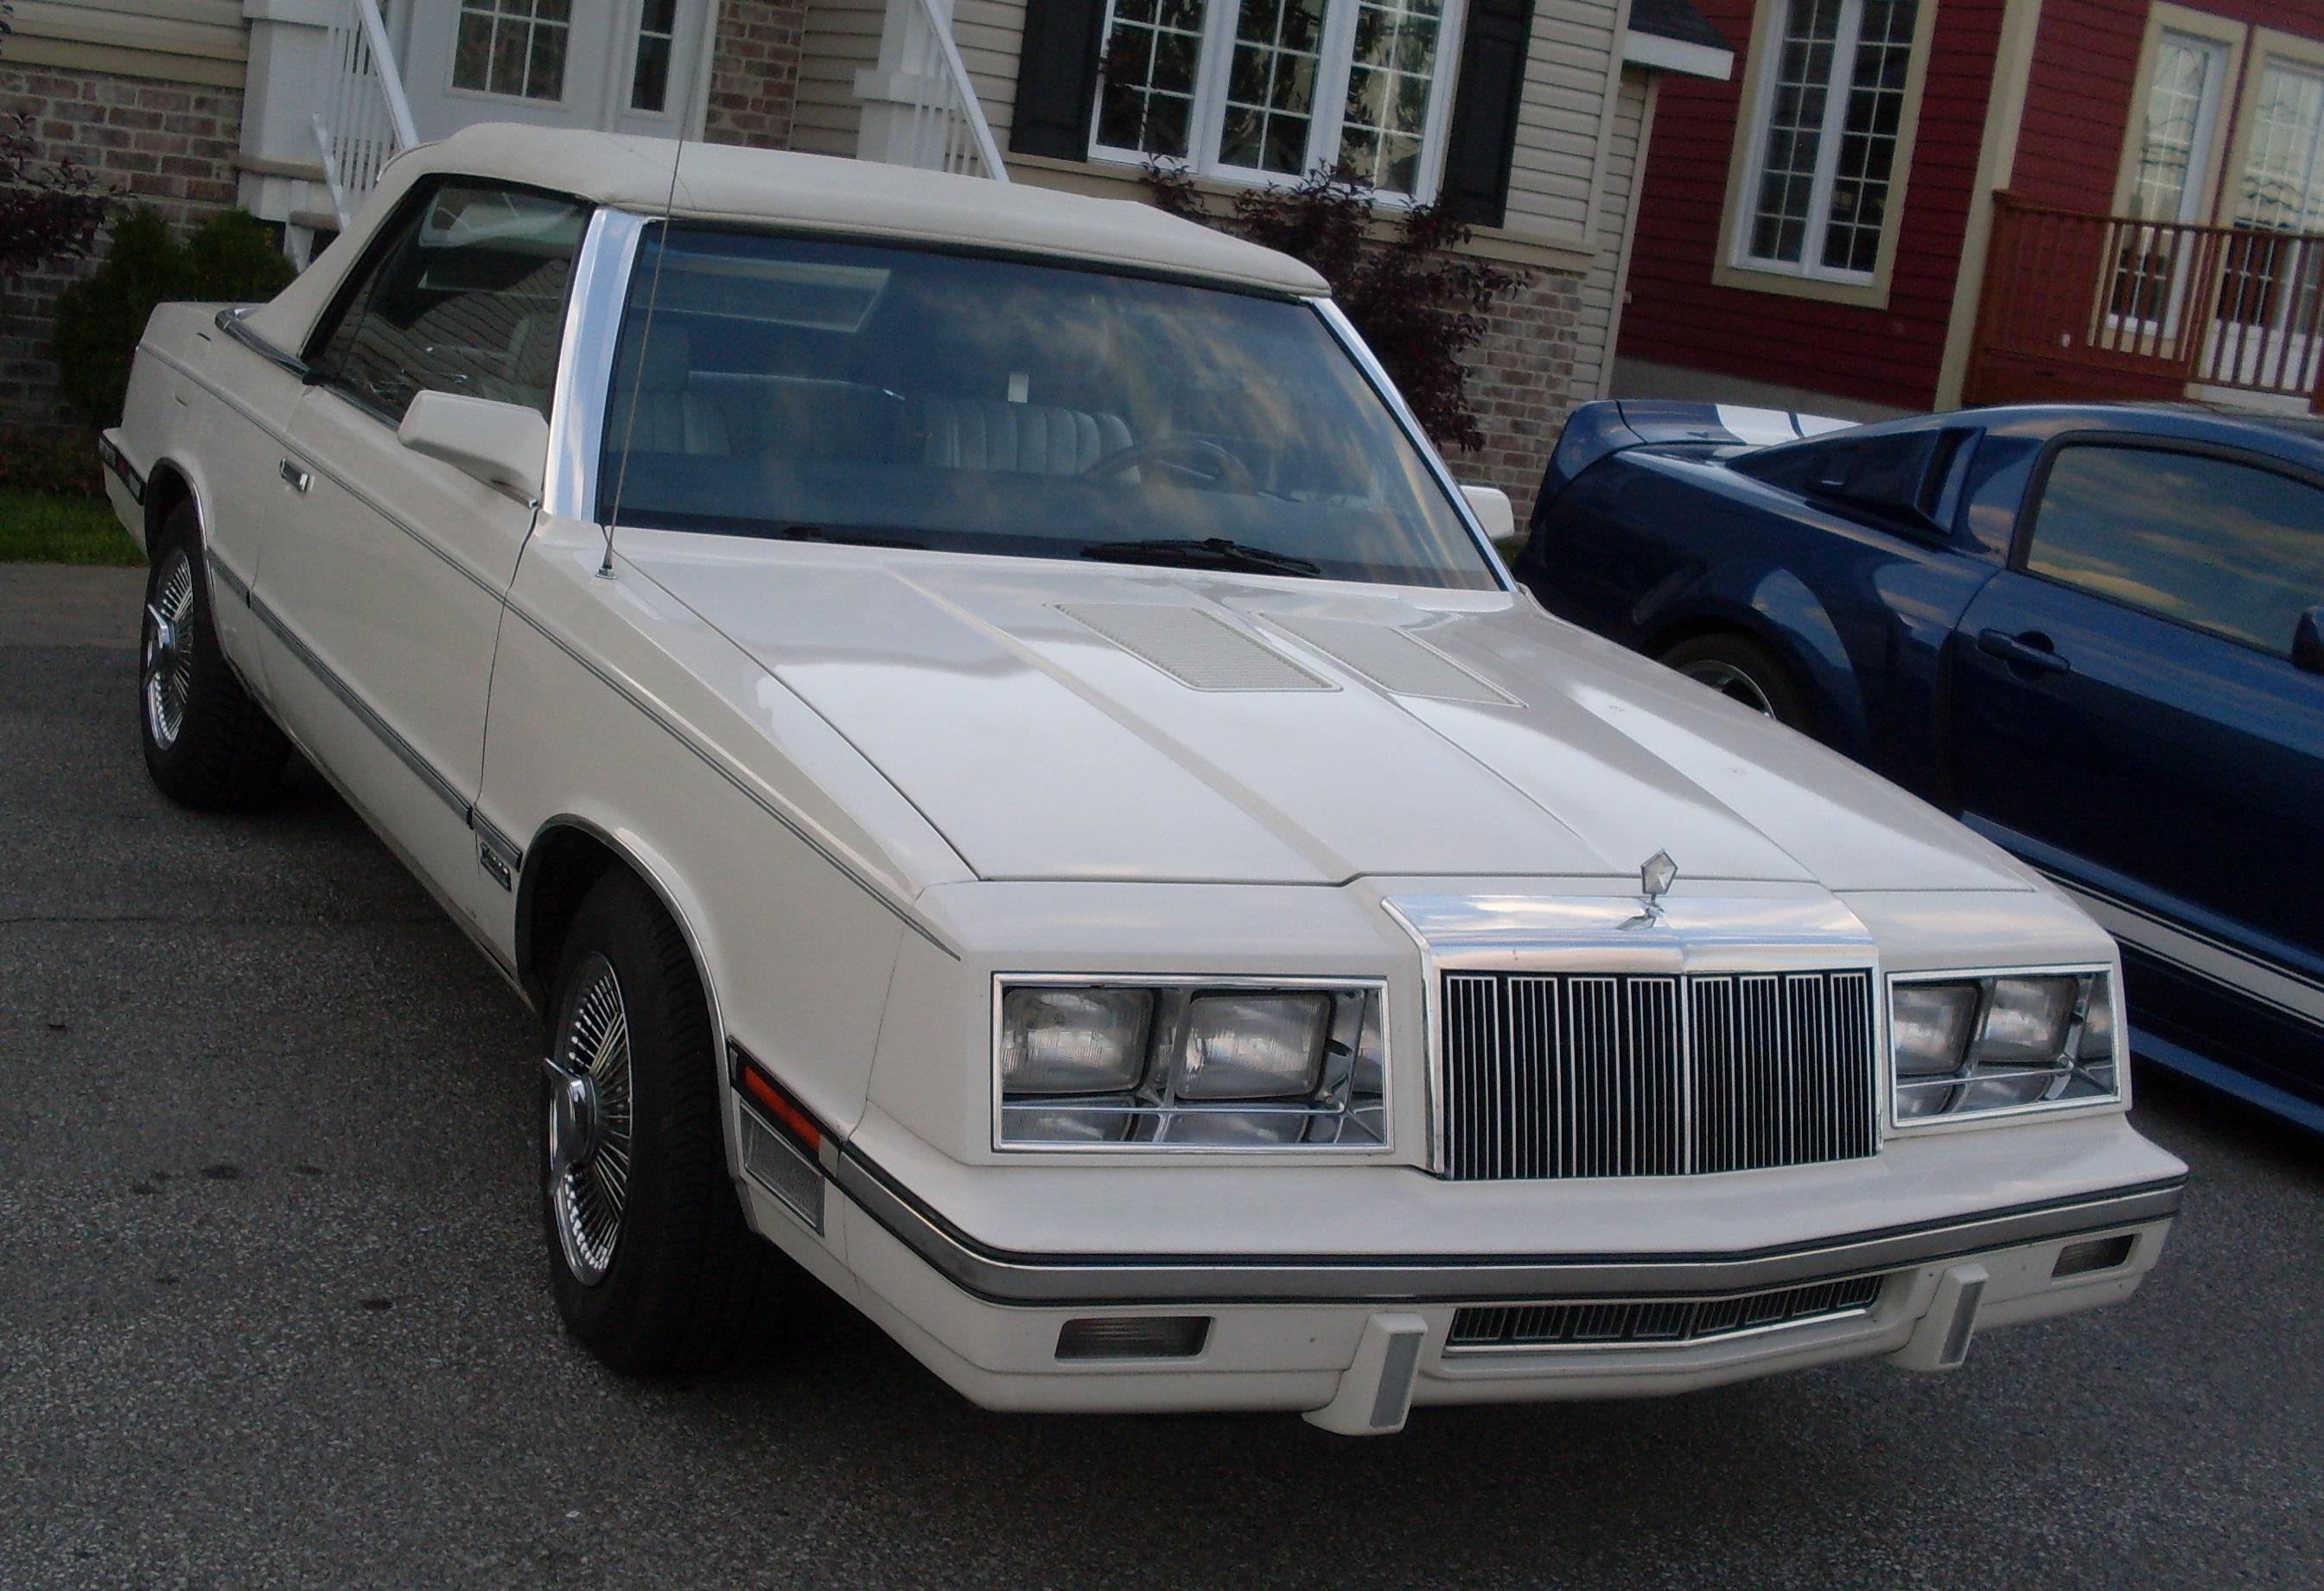 File:Chrysler LeBaron K-Body Convertible (Auto classique St-Lin-Laurentides '13).JPG - Wikimedia ...